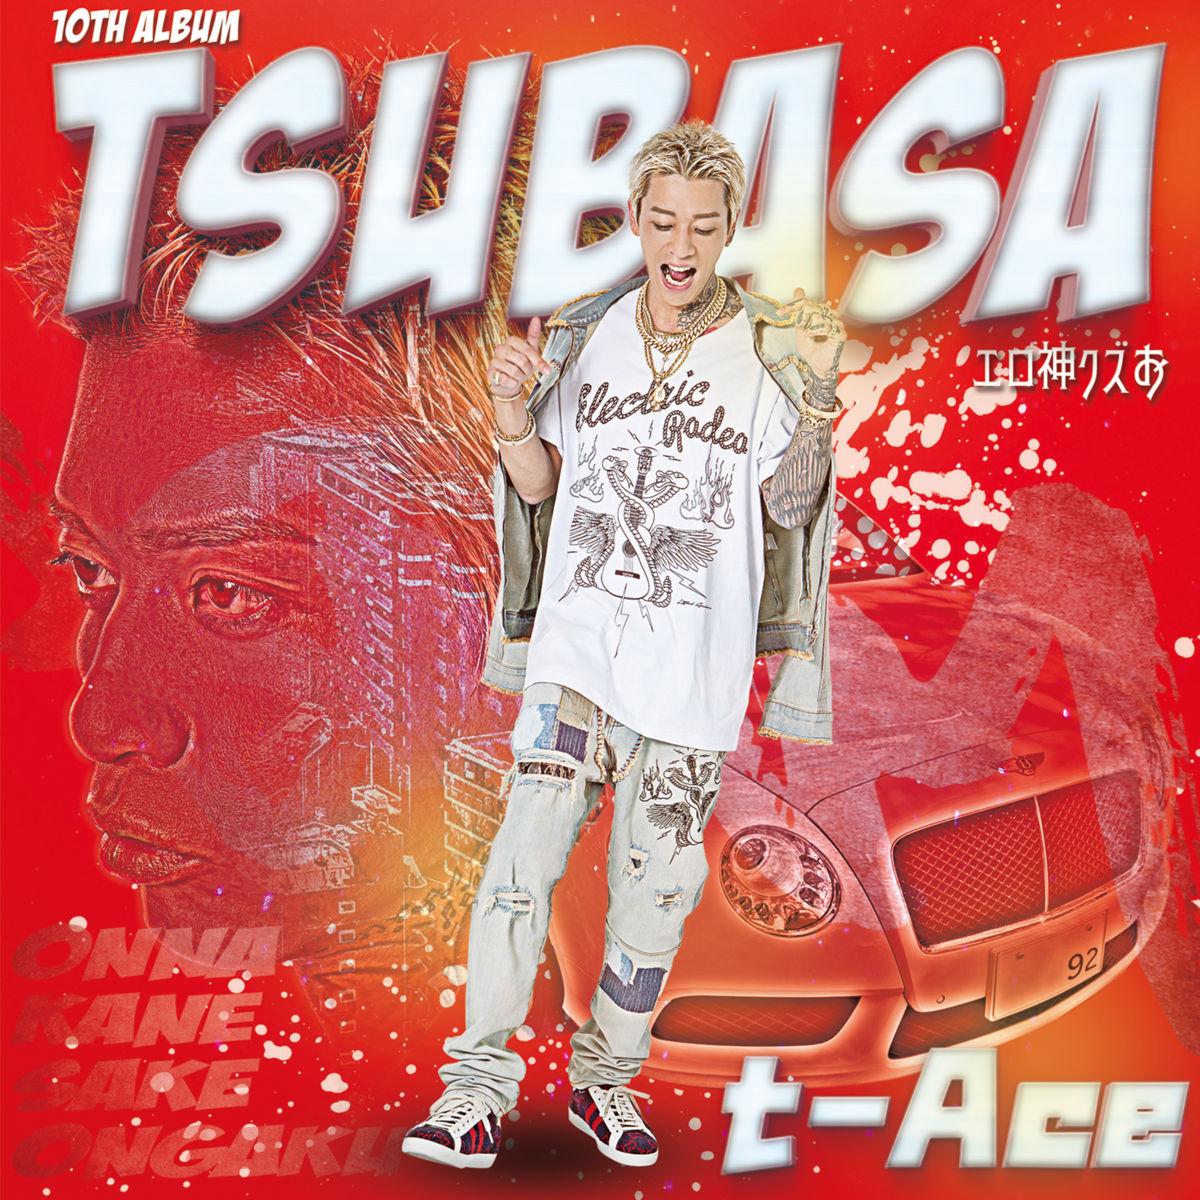 『t-Ace - 遊びの天才』収録の『TSUBASA』ジャケット